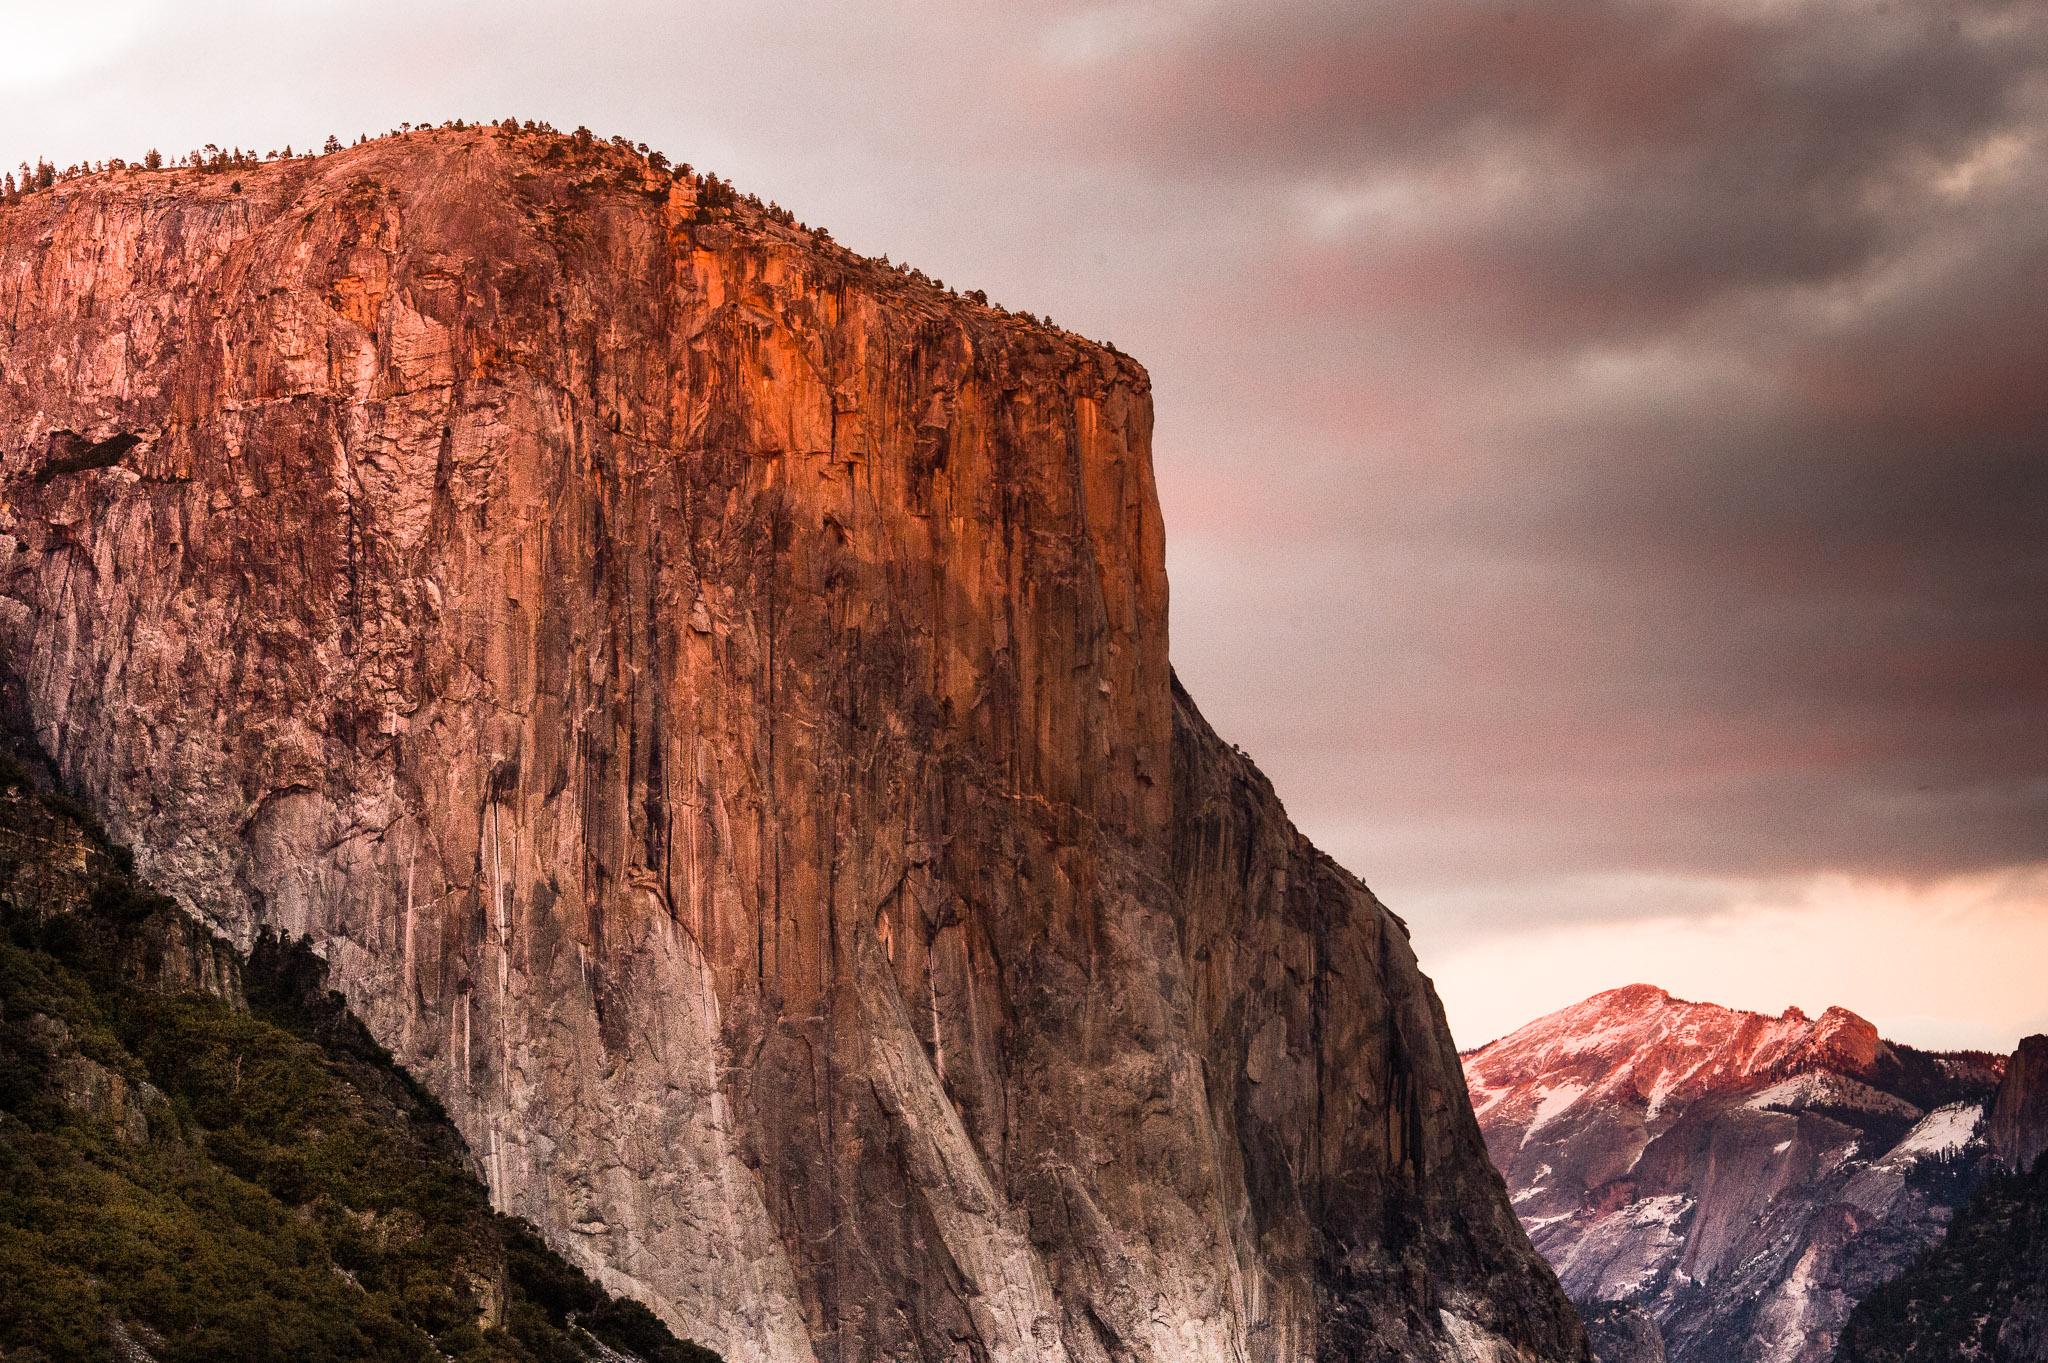 Jason-Davis-Images-Yosemite-0043.jpg